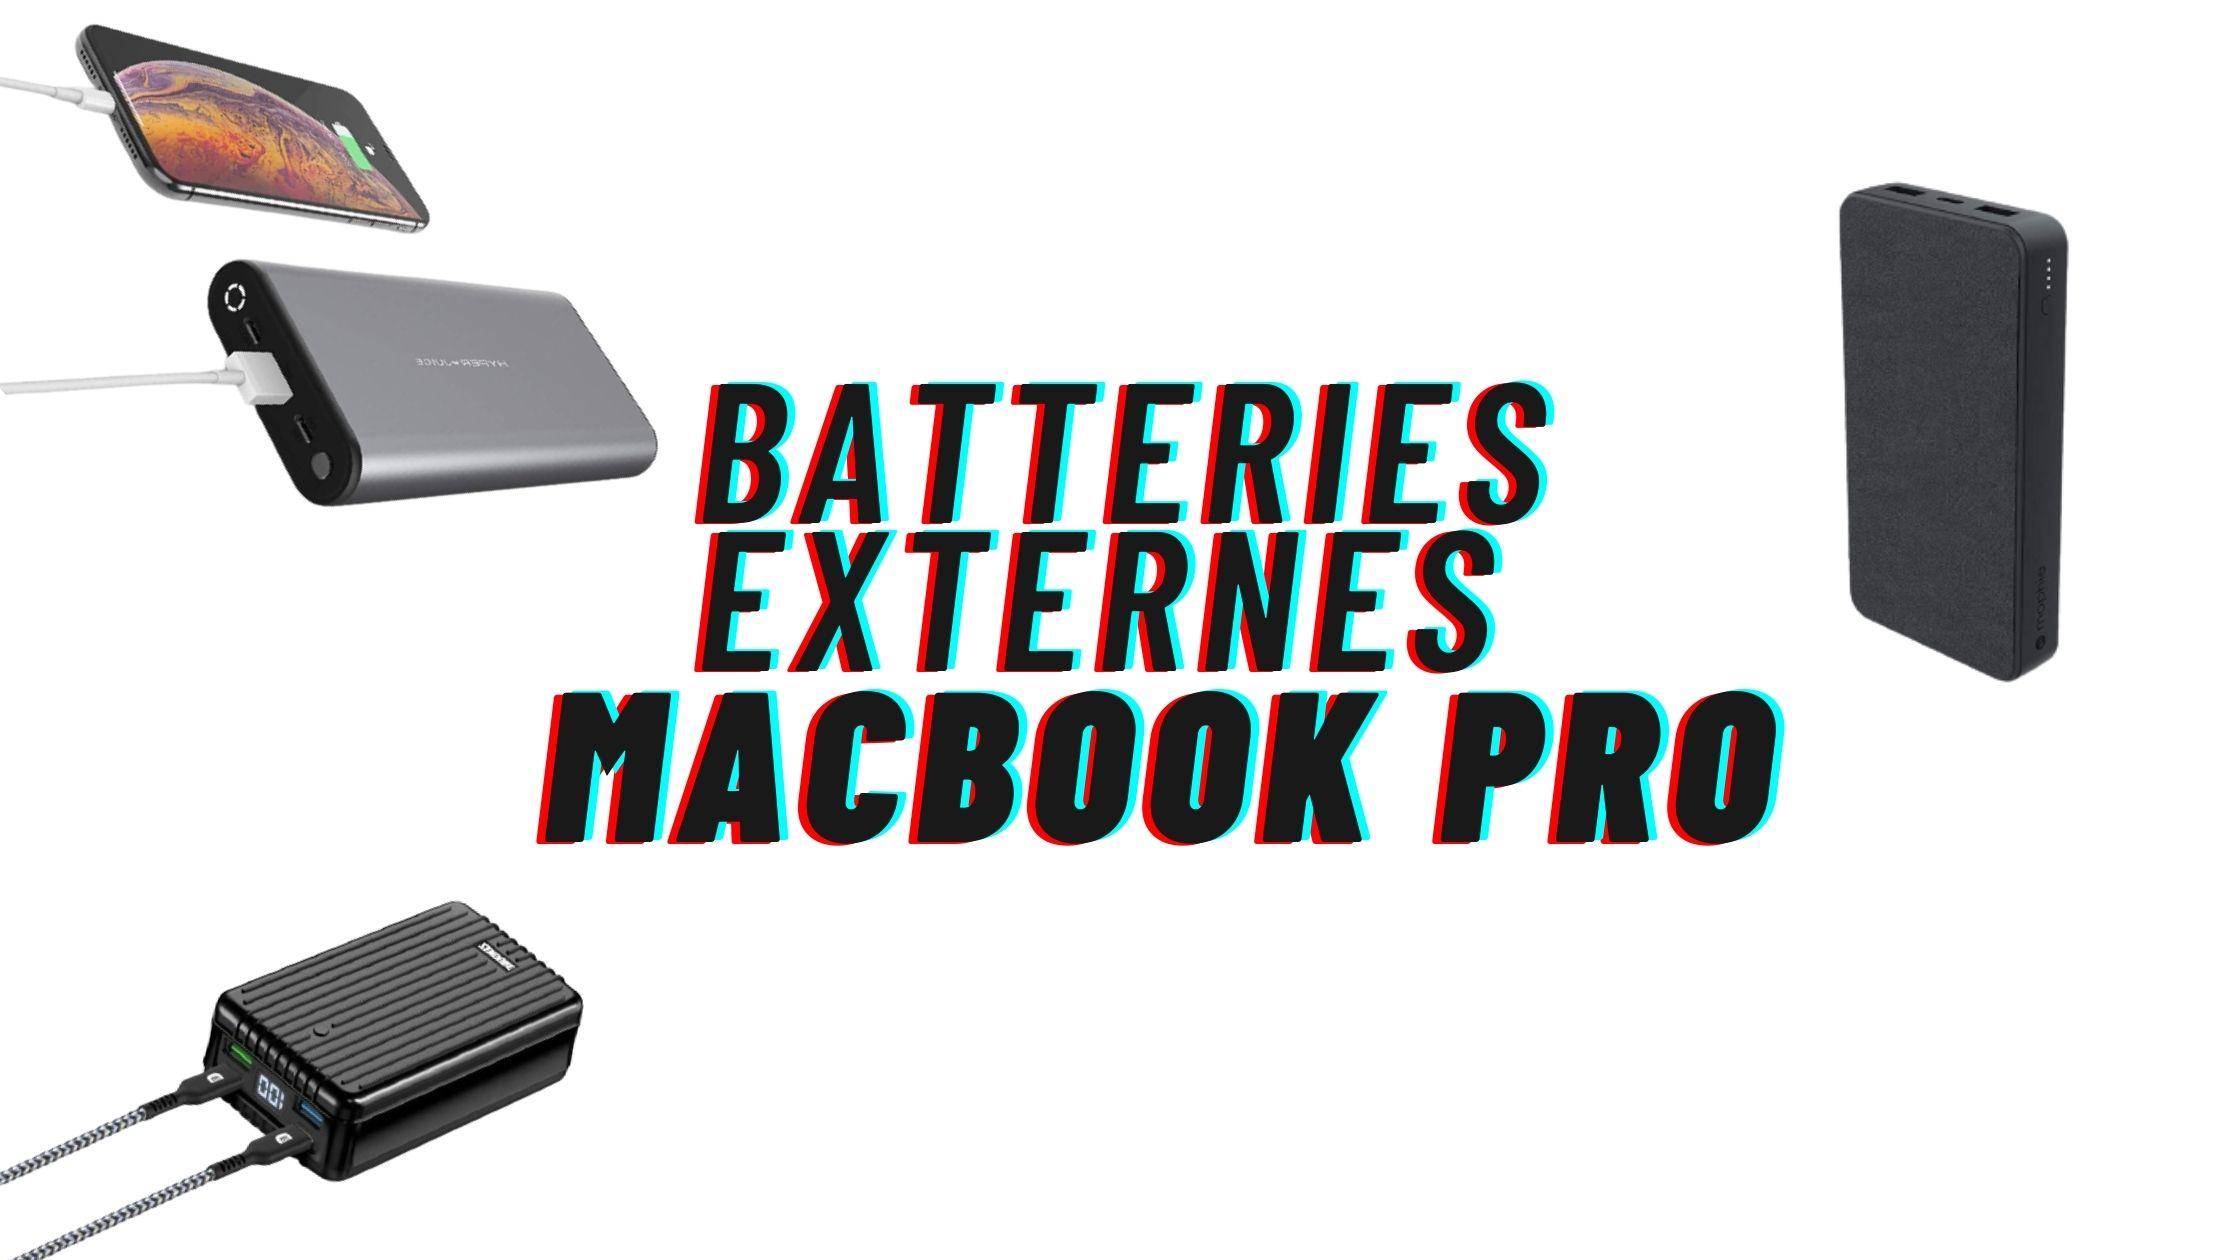 batteries externes macbook pro